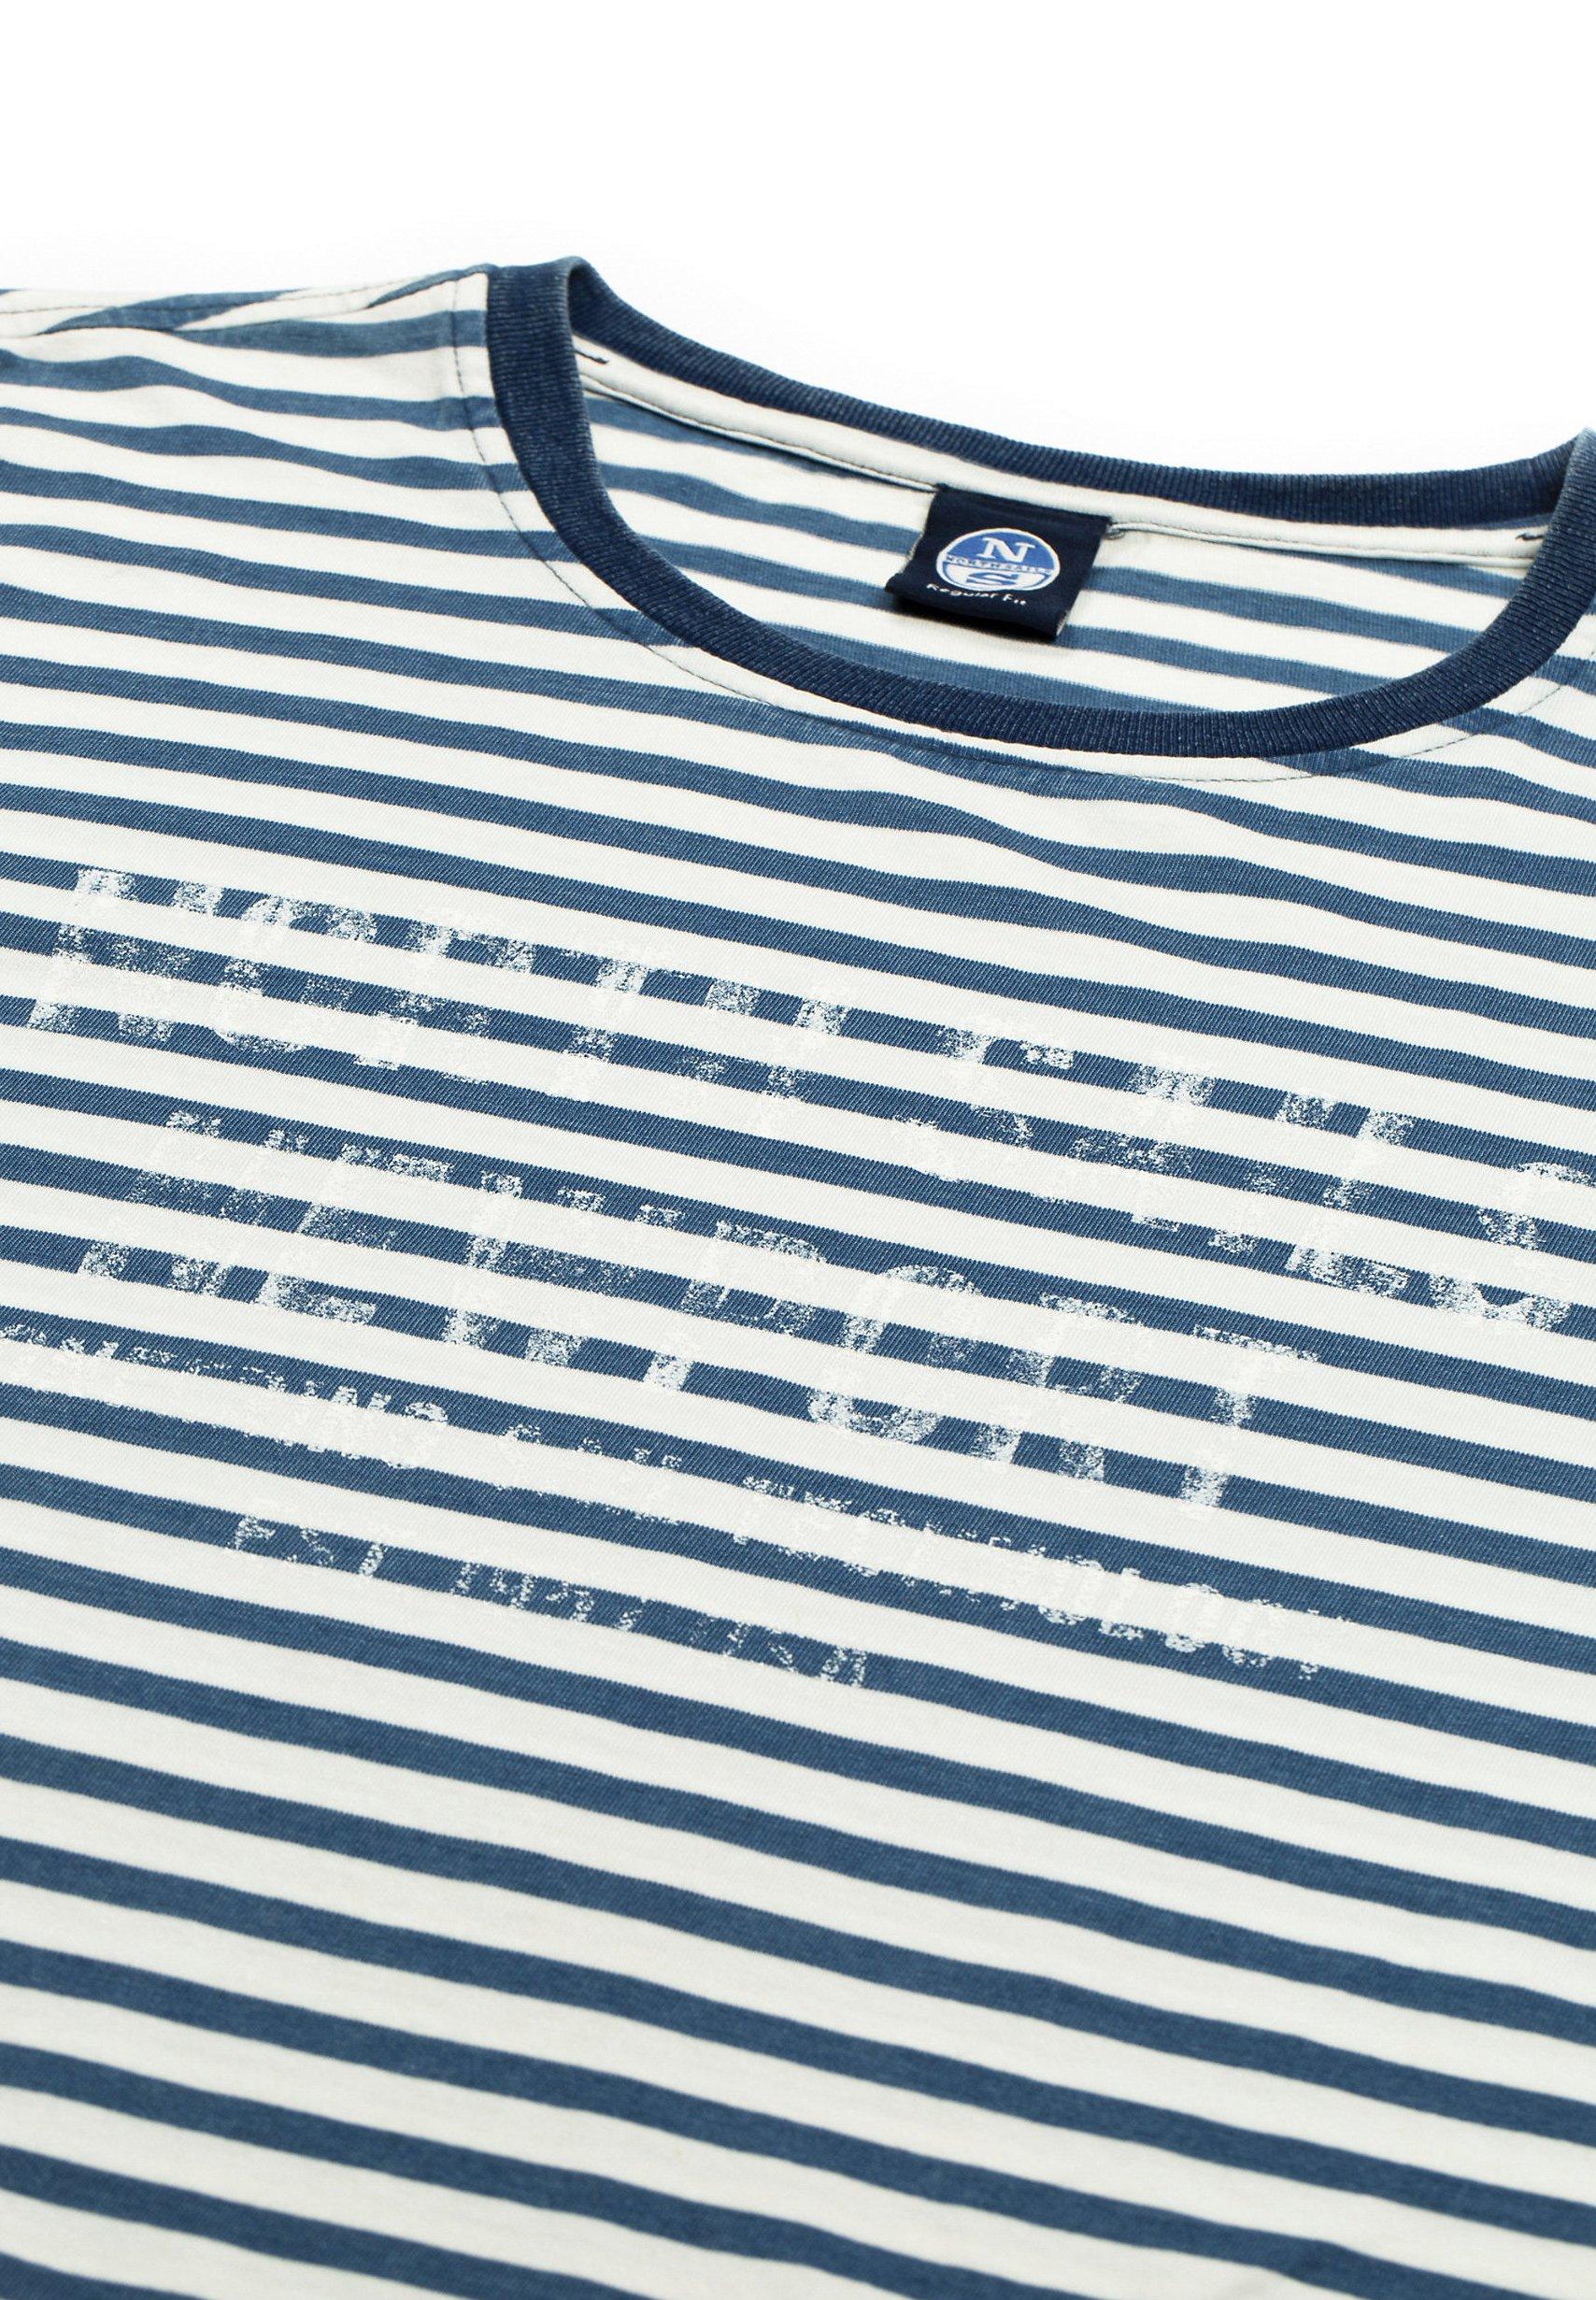 North Sails Print T-shirt - white yN08c